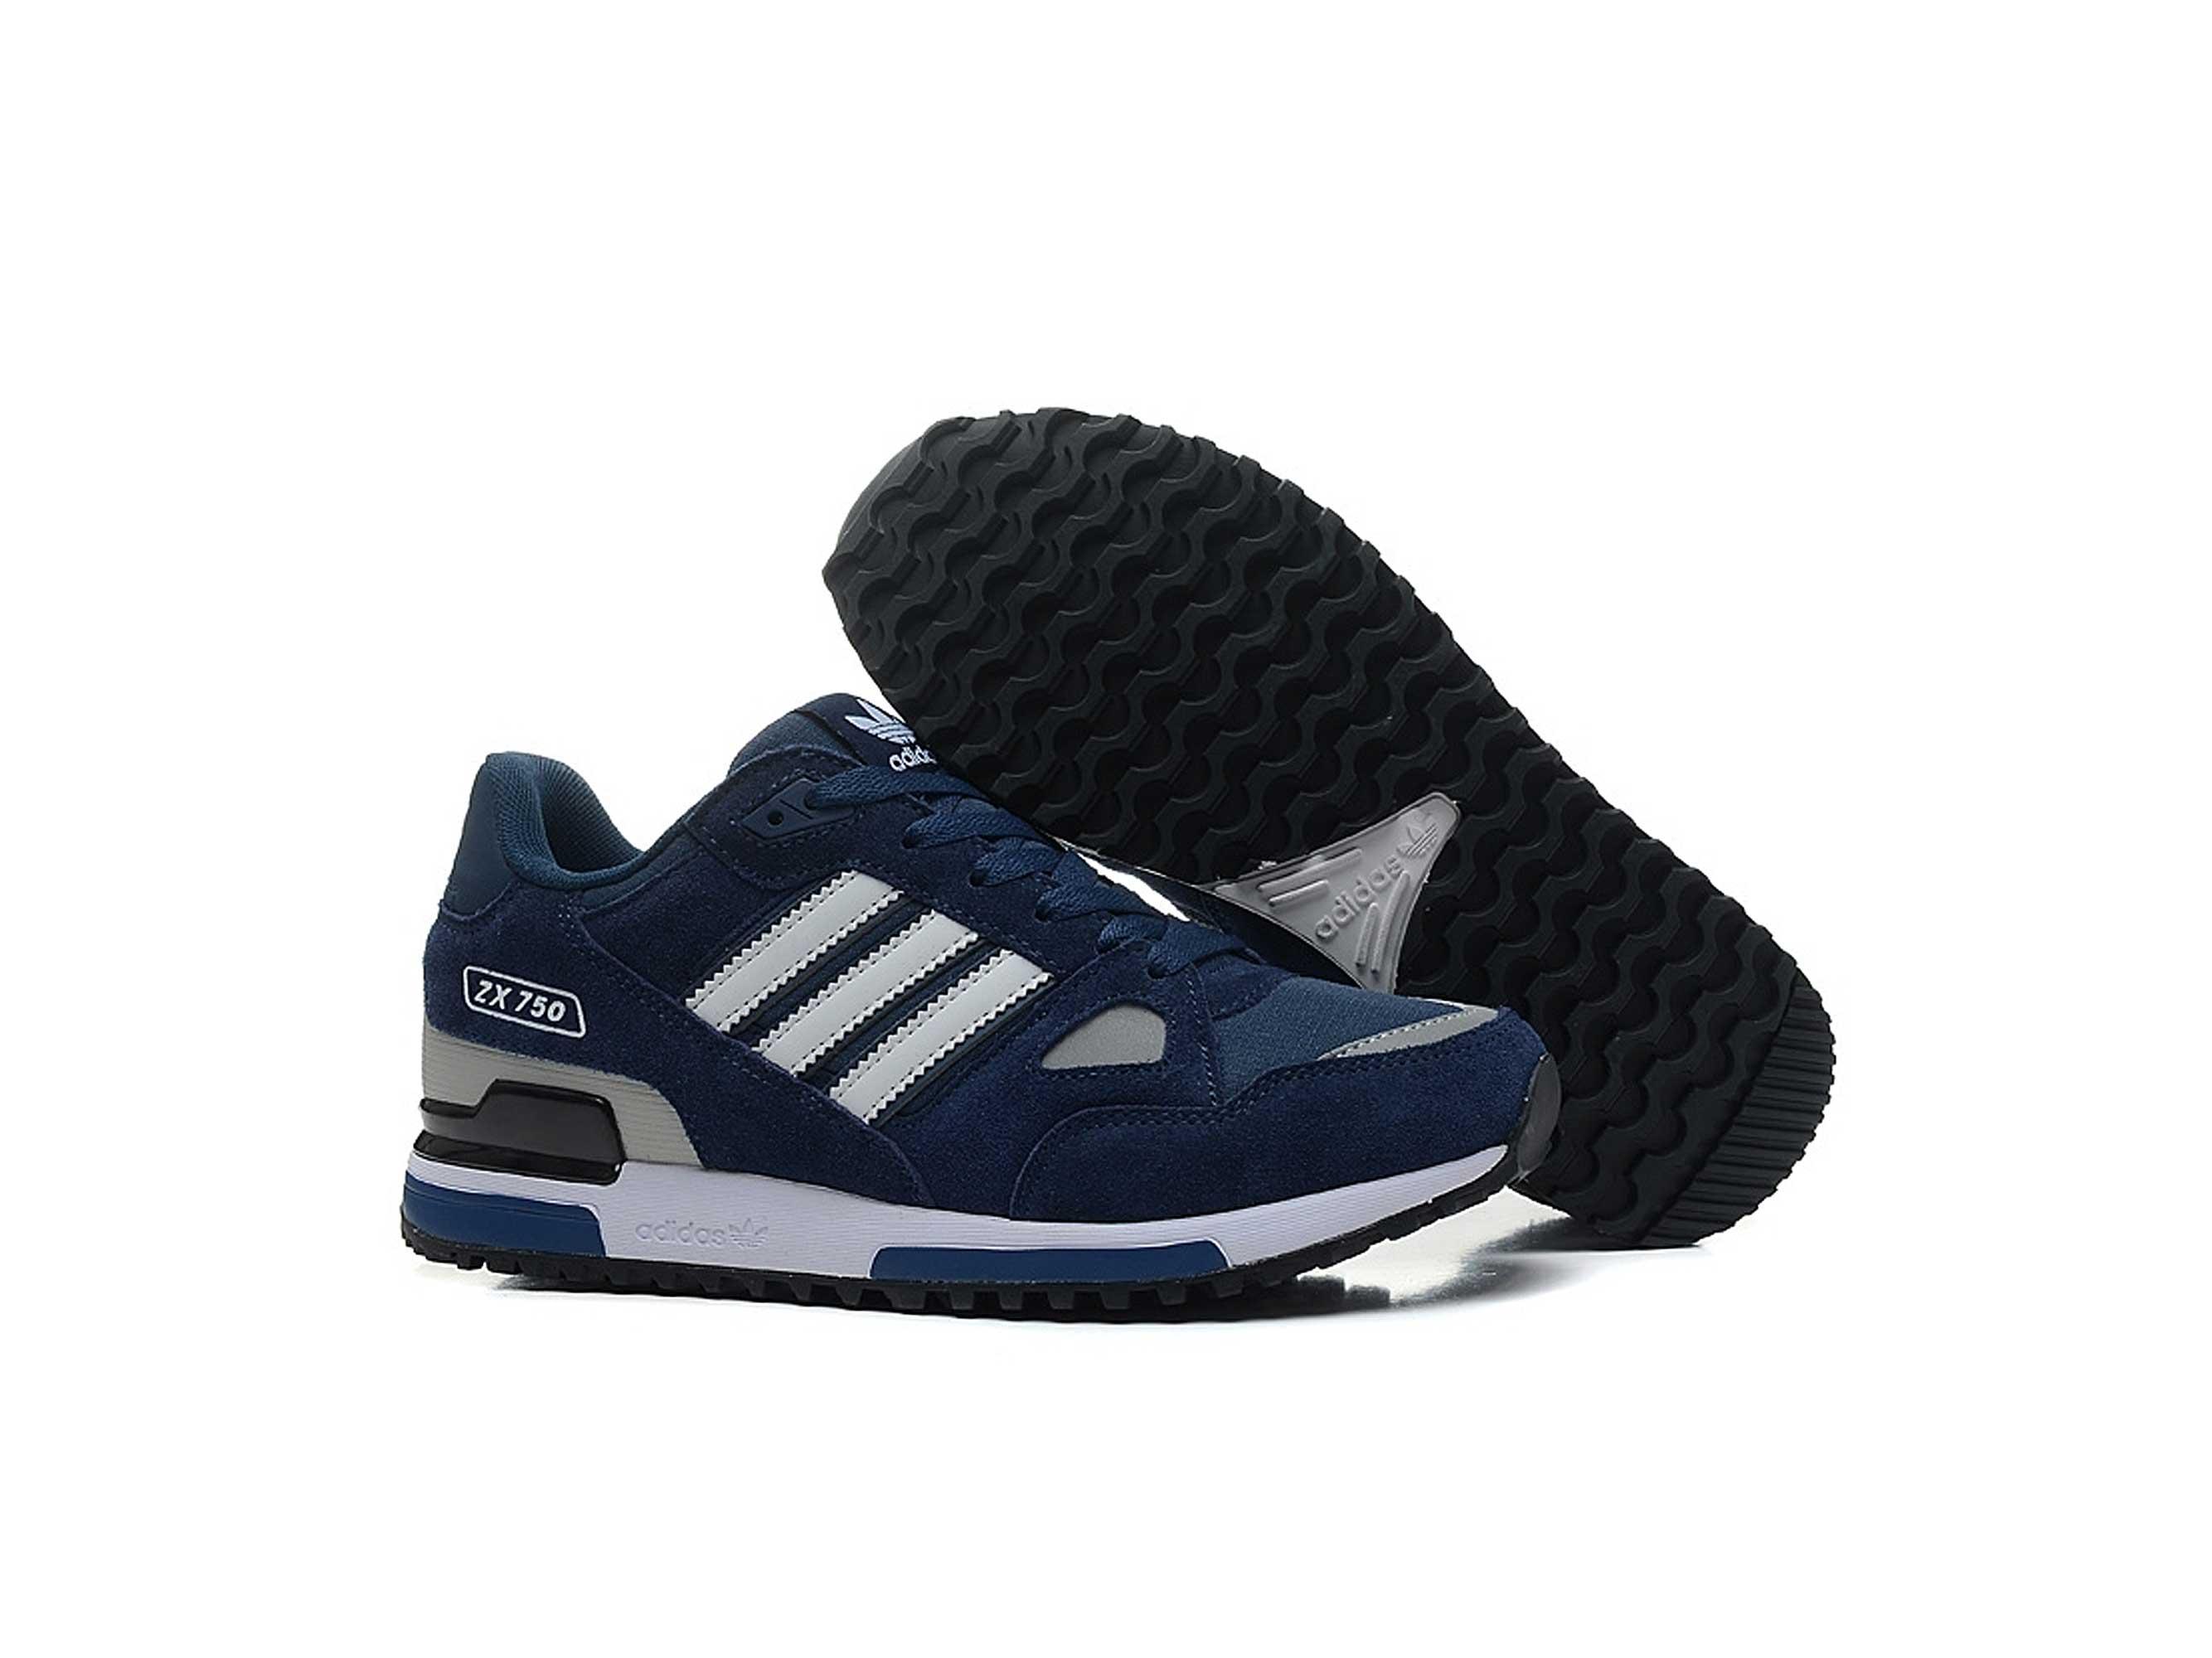 04f6d6422 Adidas ZX 750 Dark Blue Gray ⋆ adidas интернет магазин